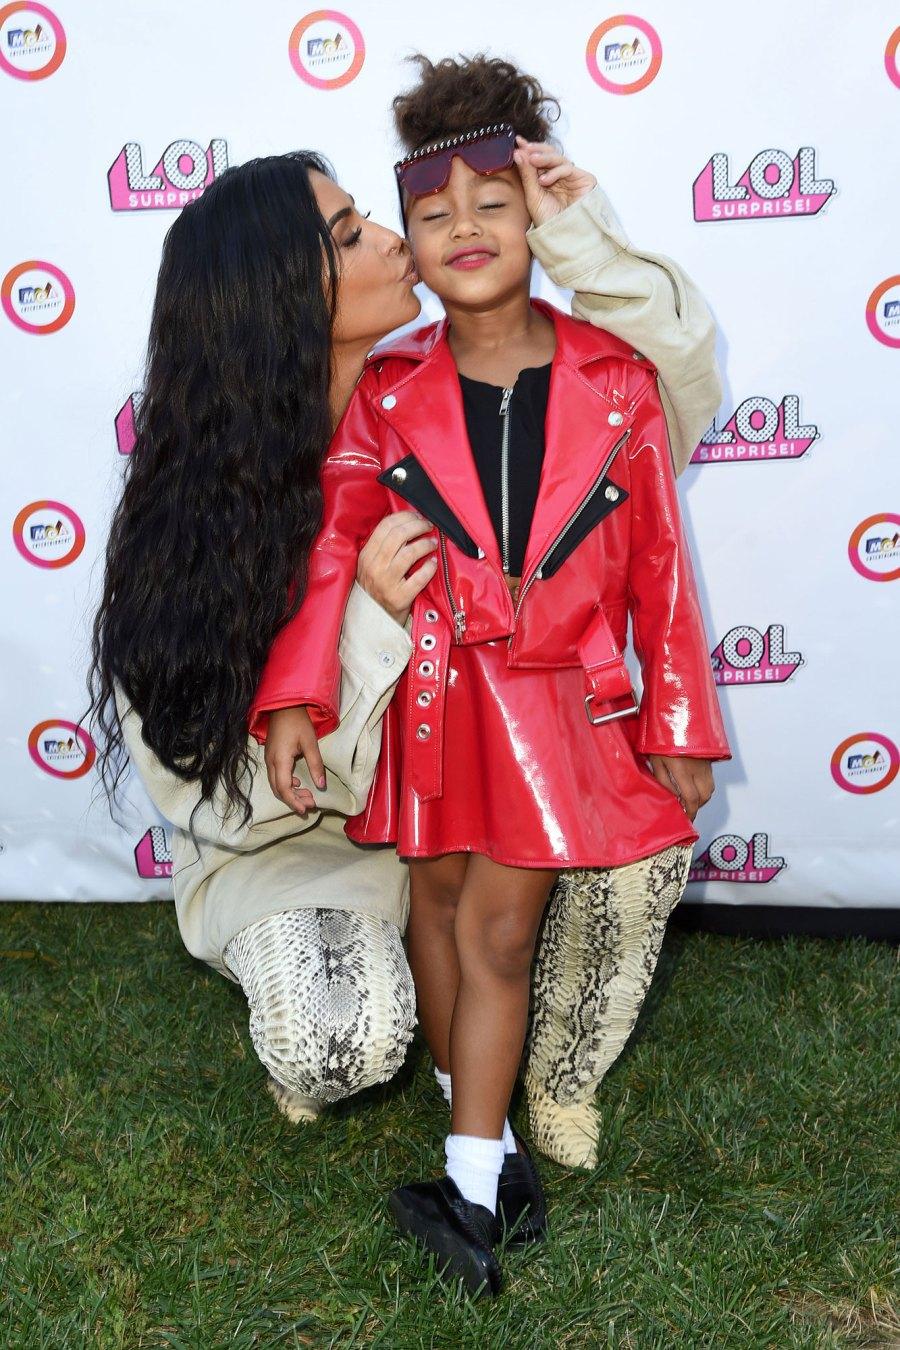 North West Red Lipstick and Kim Kardashian Fashion Show